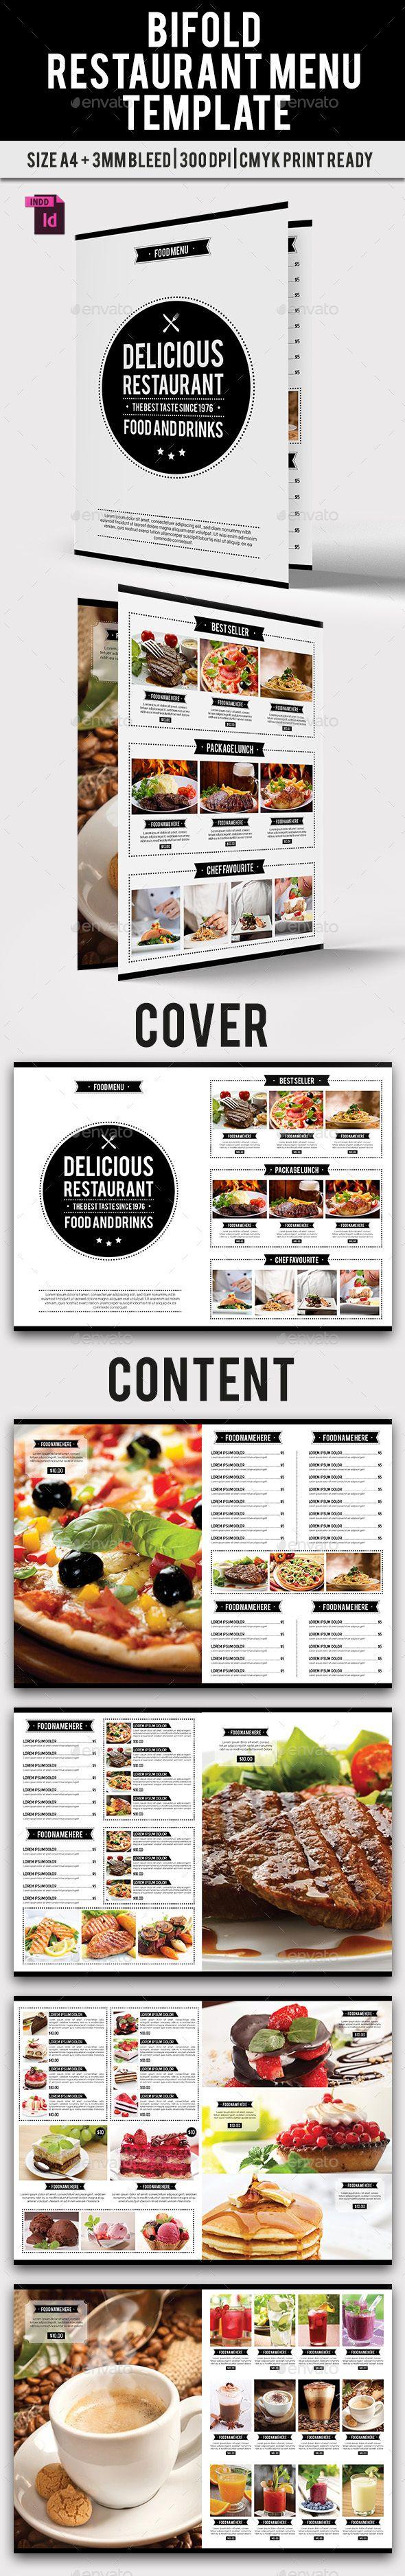 BiFold Restaurant Menu Template InDesign INDD. Download here: http://graphicriver.net/item/bifold-restaurant-menu-vol-9/15174253?ref=ksioks